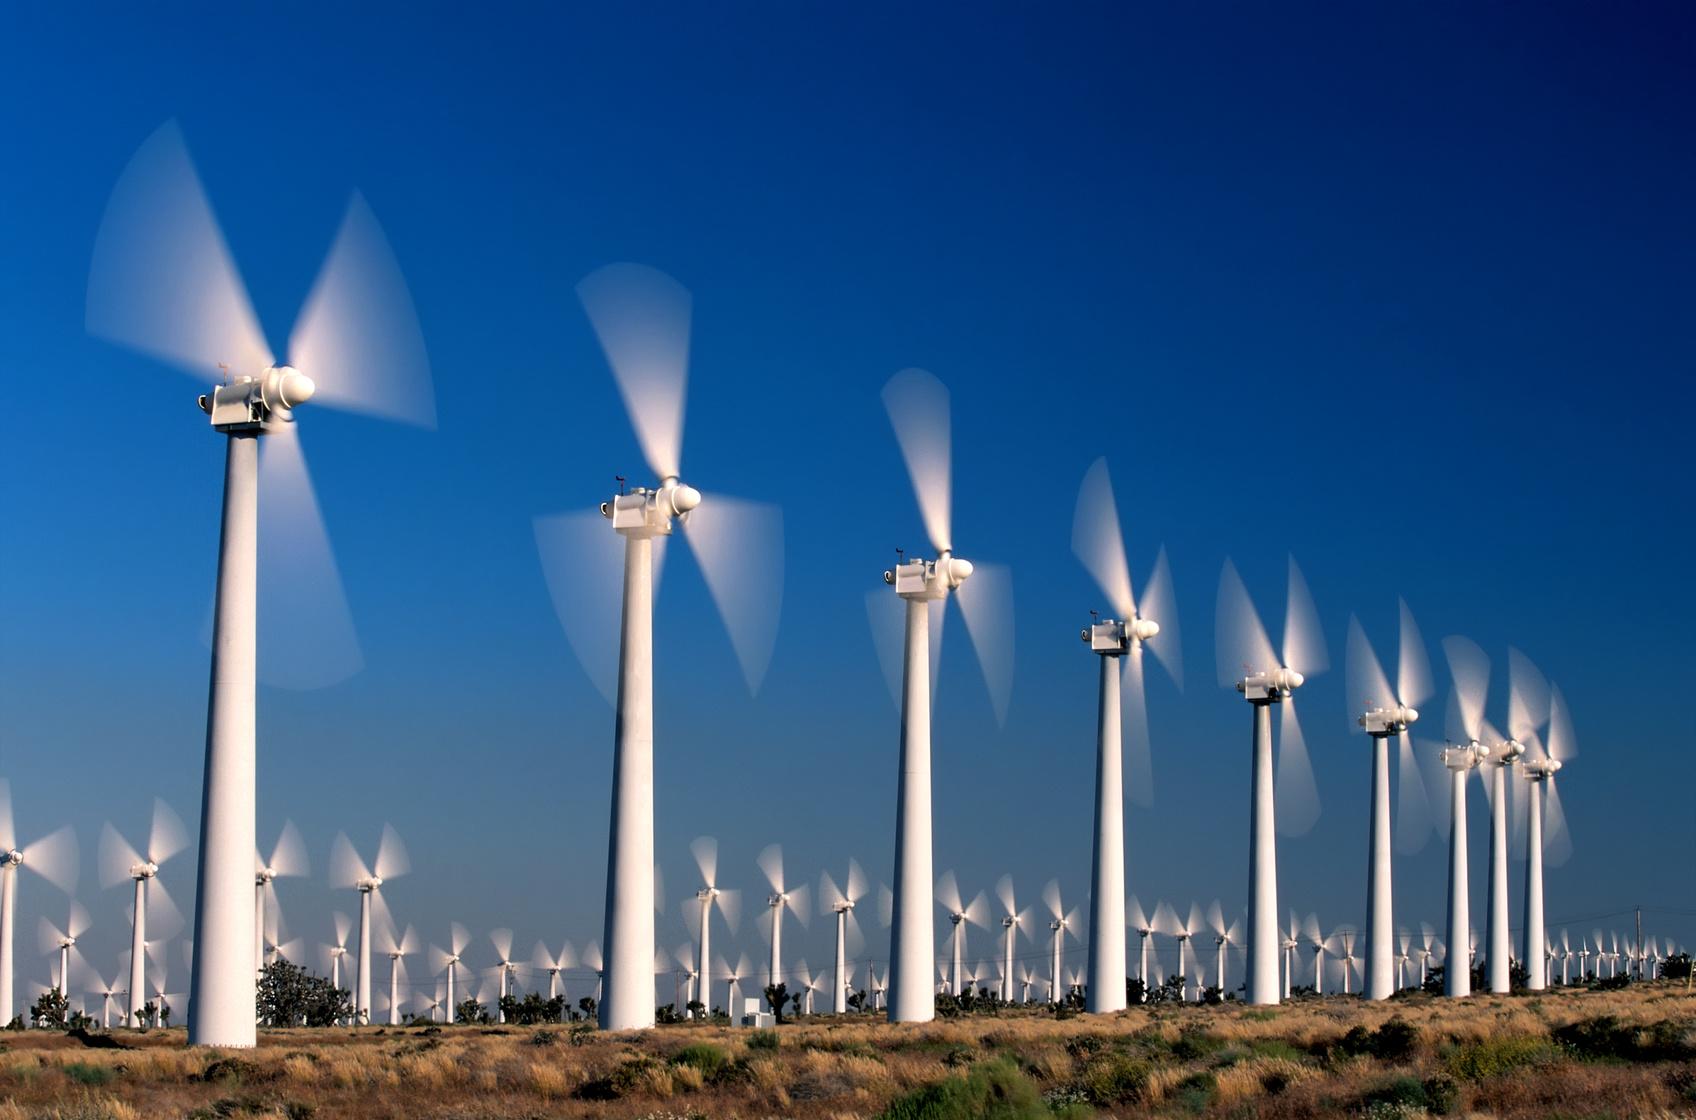 Fotolia_79542277_Wind Turbines_M